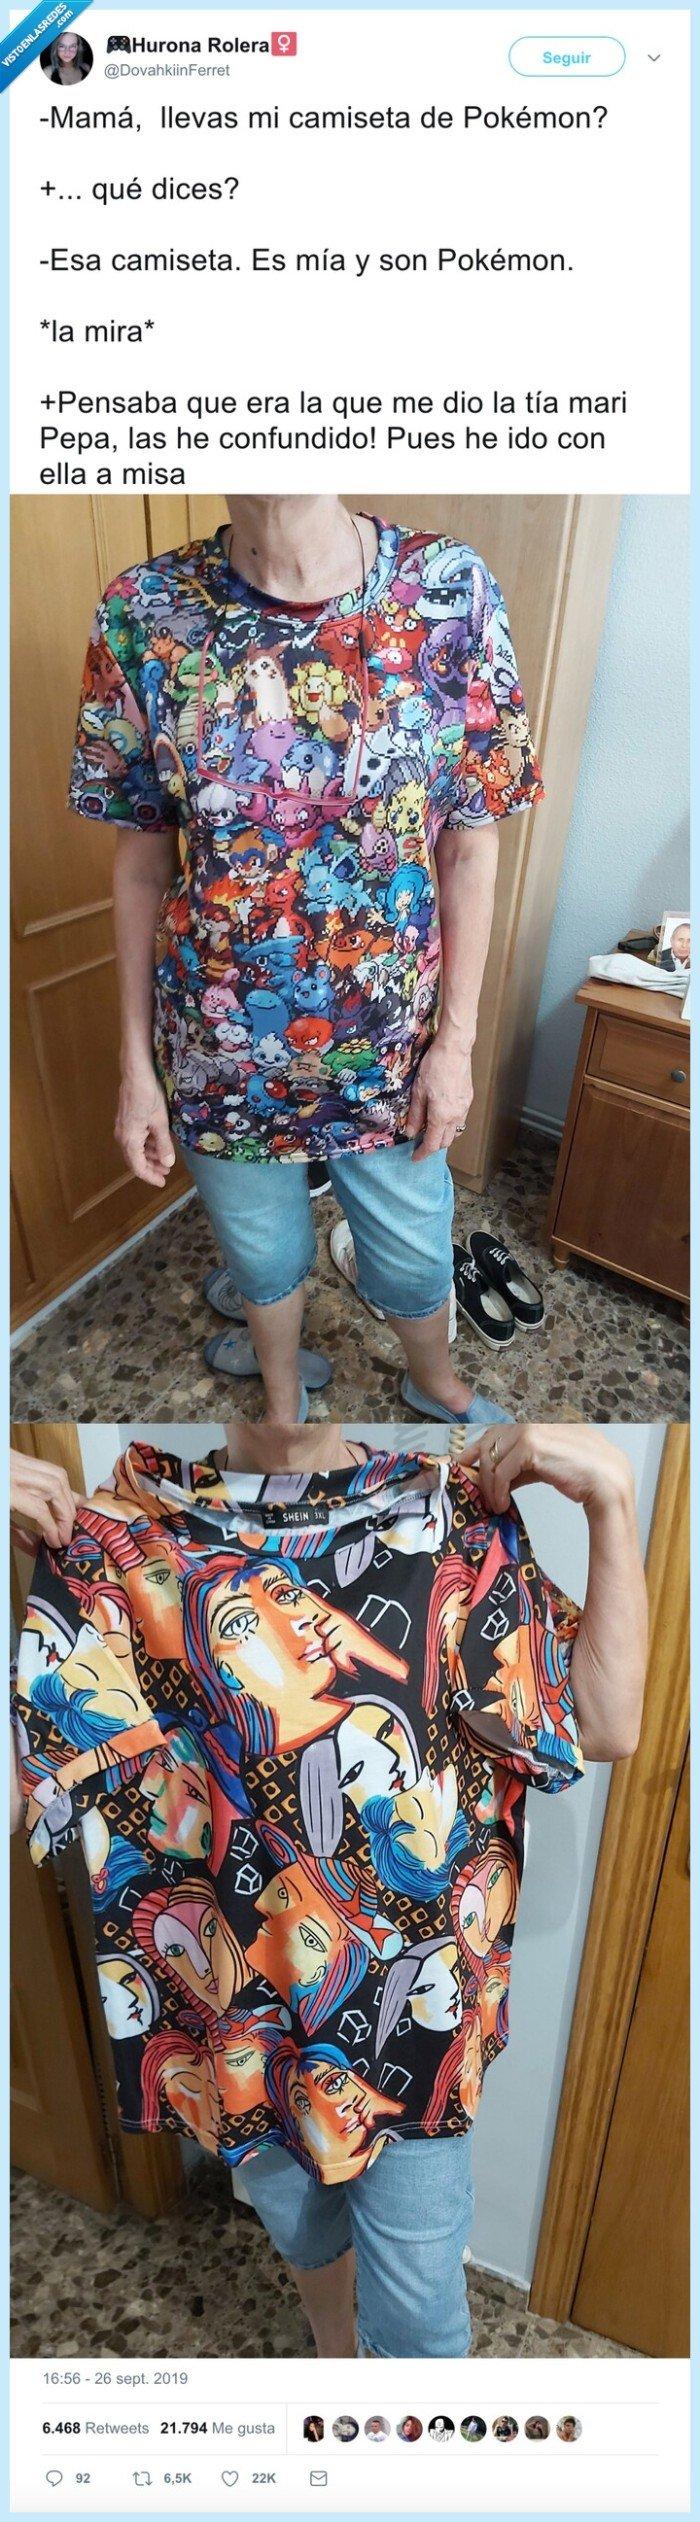 camiseta,madre,misa,pokemon